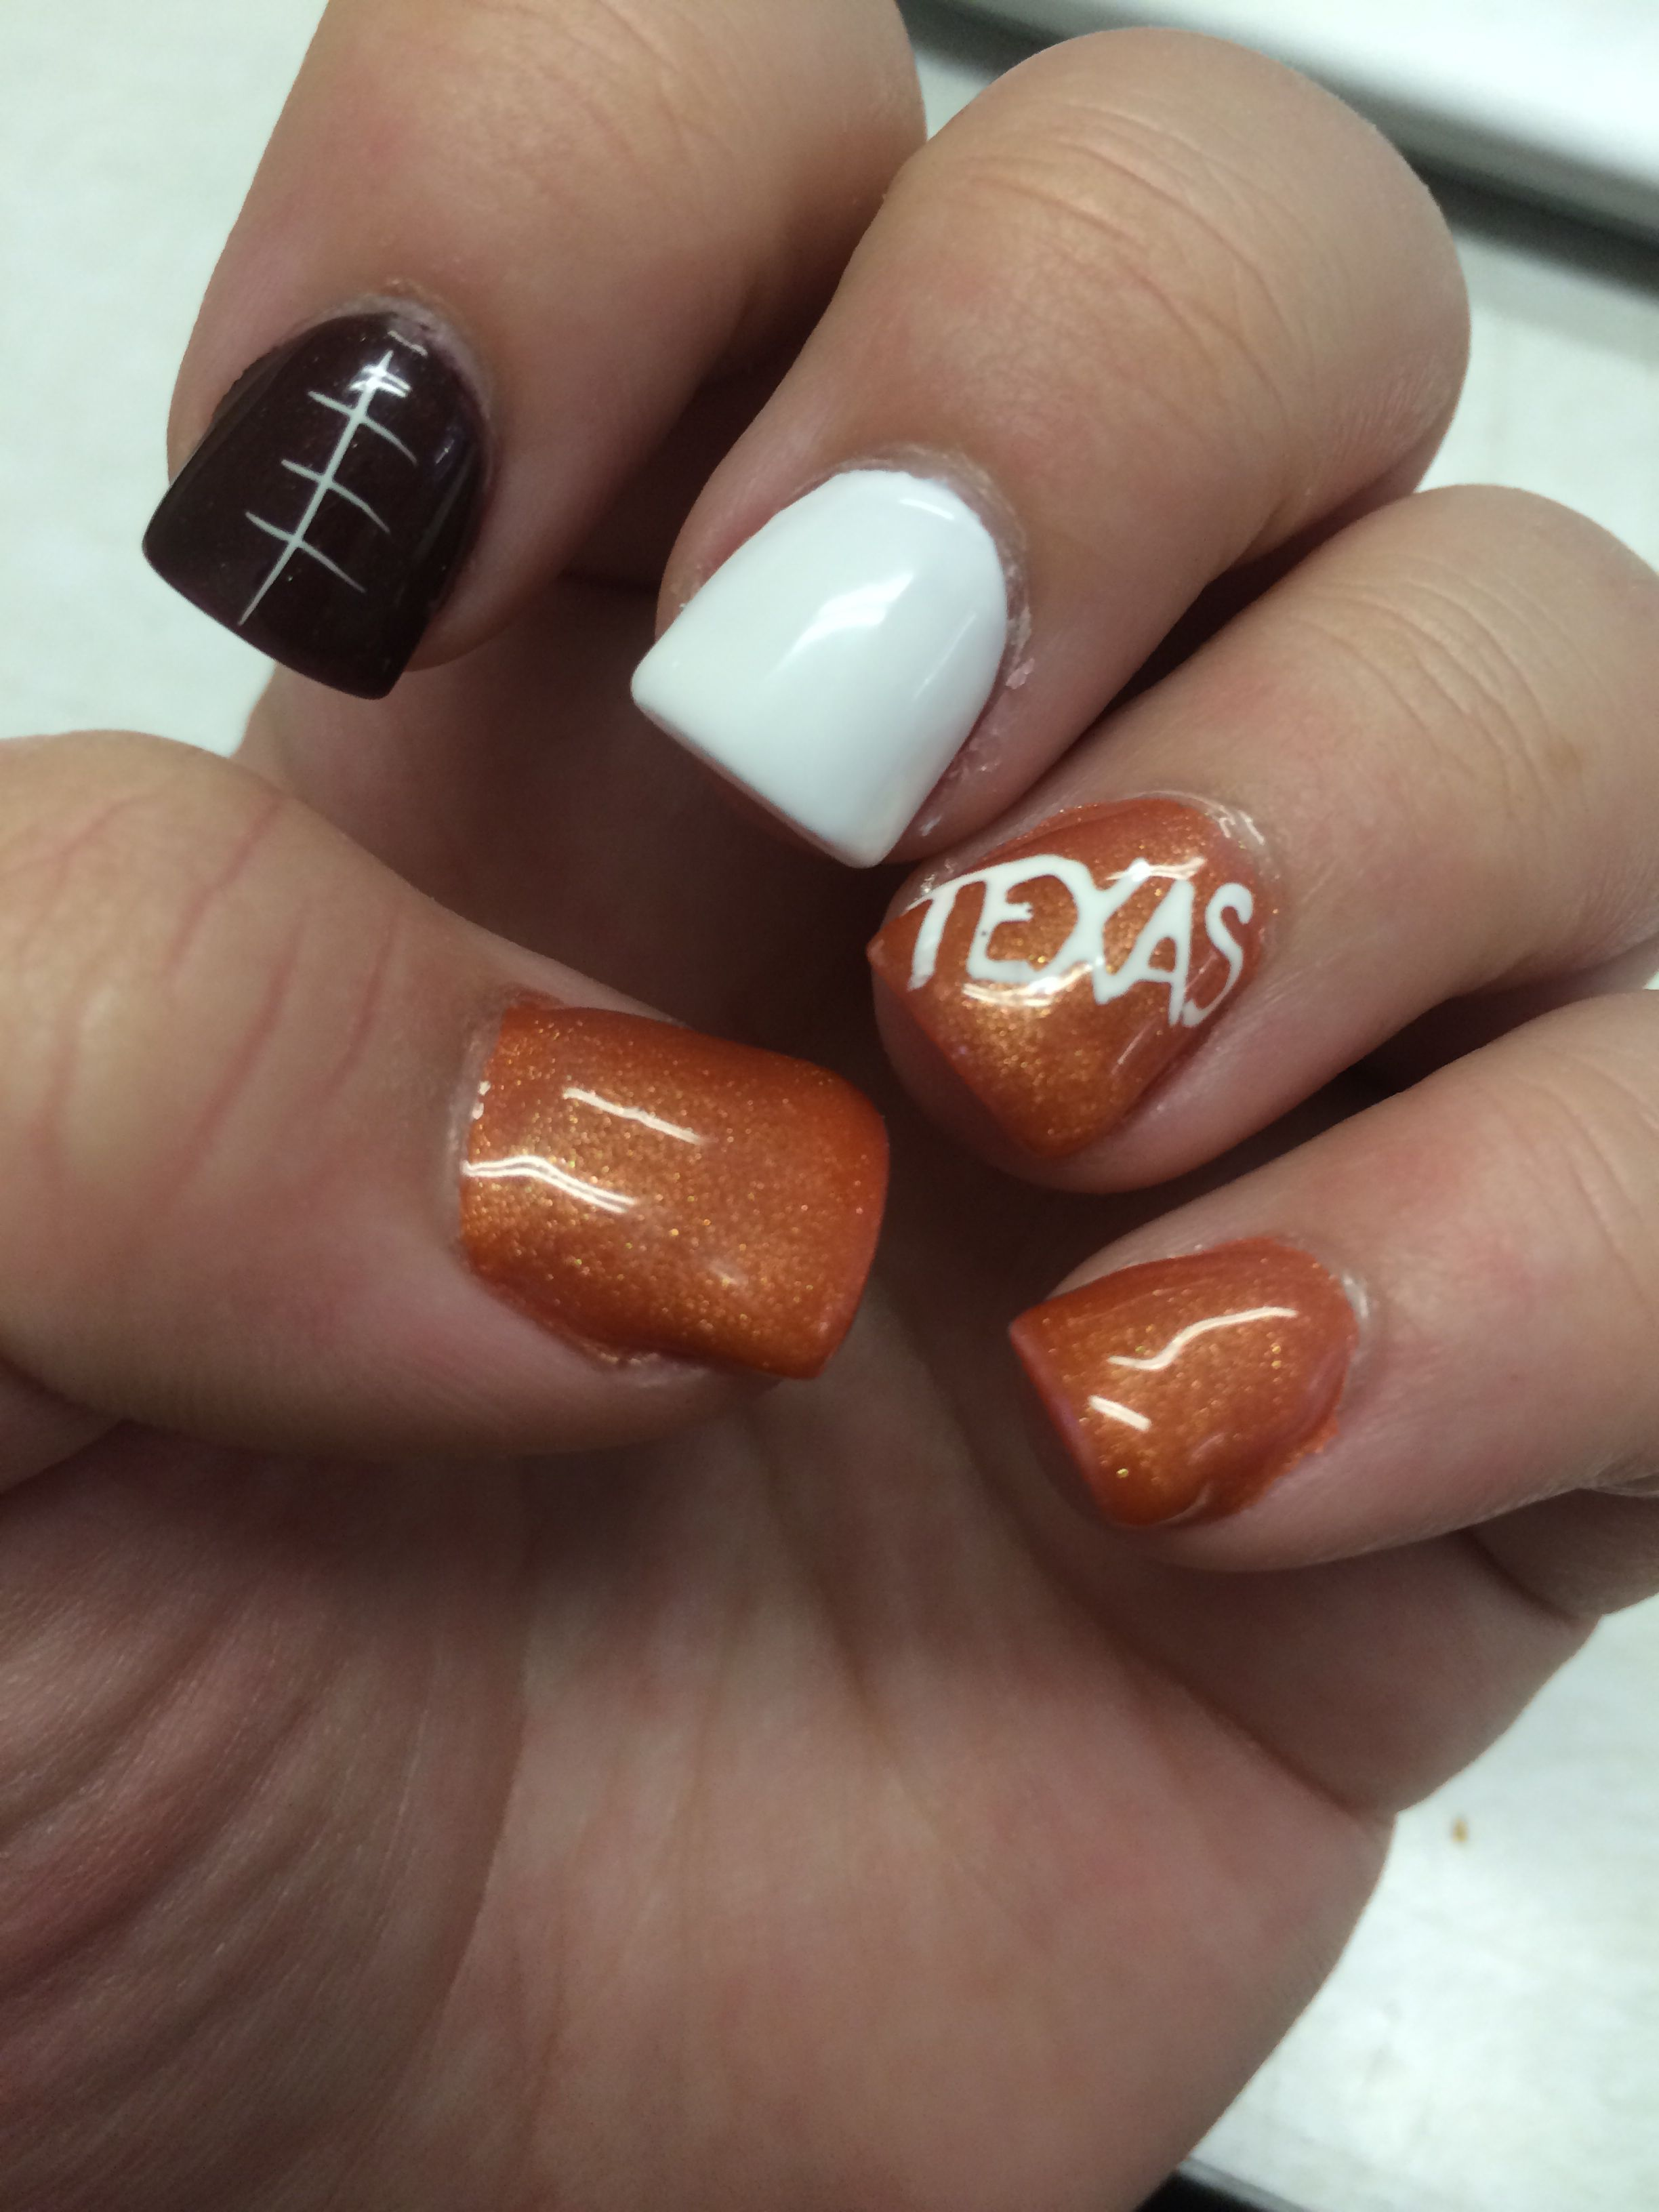 Texas Longhorn nails by Marlene H. Modesto Calif. | nail | Pinterest ...